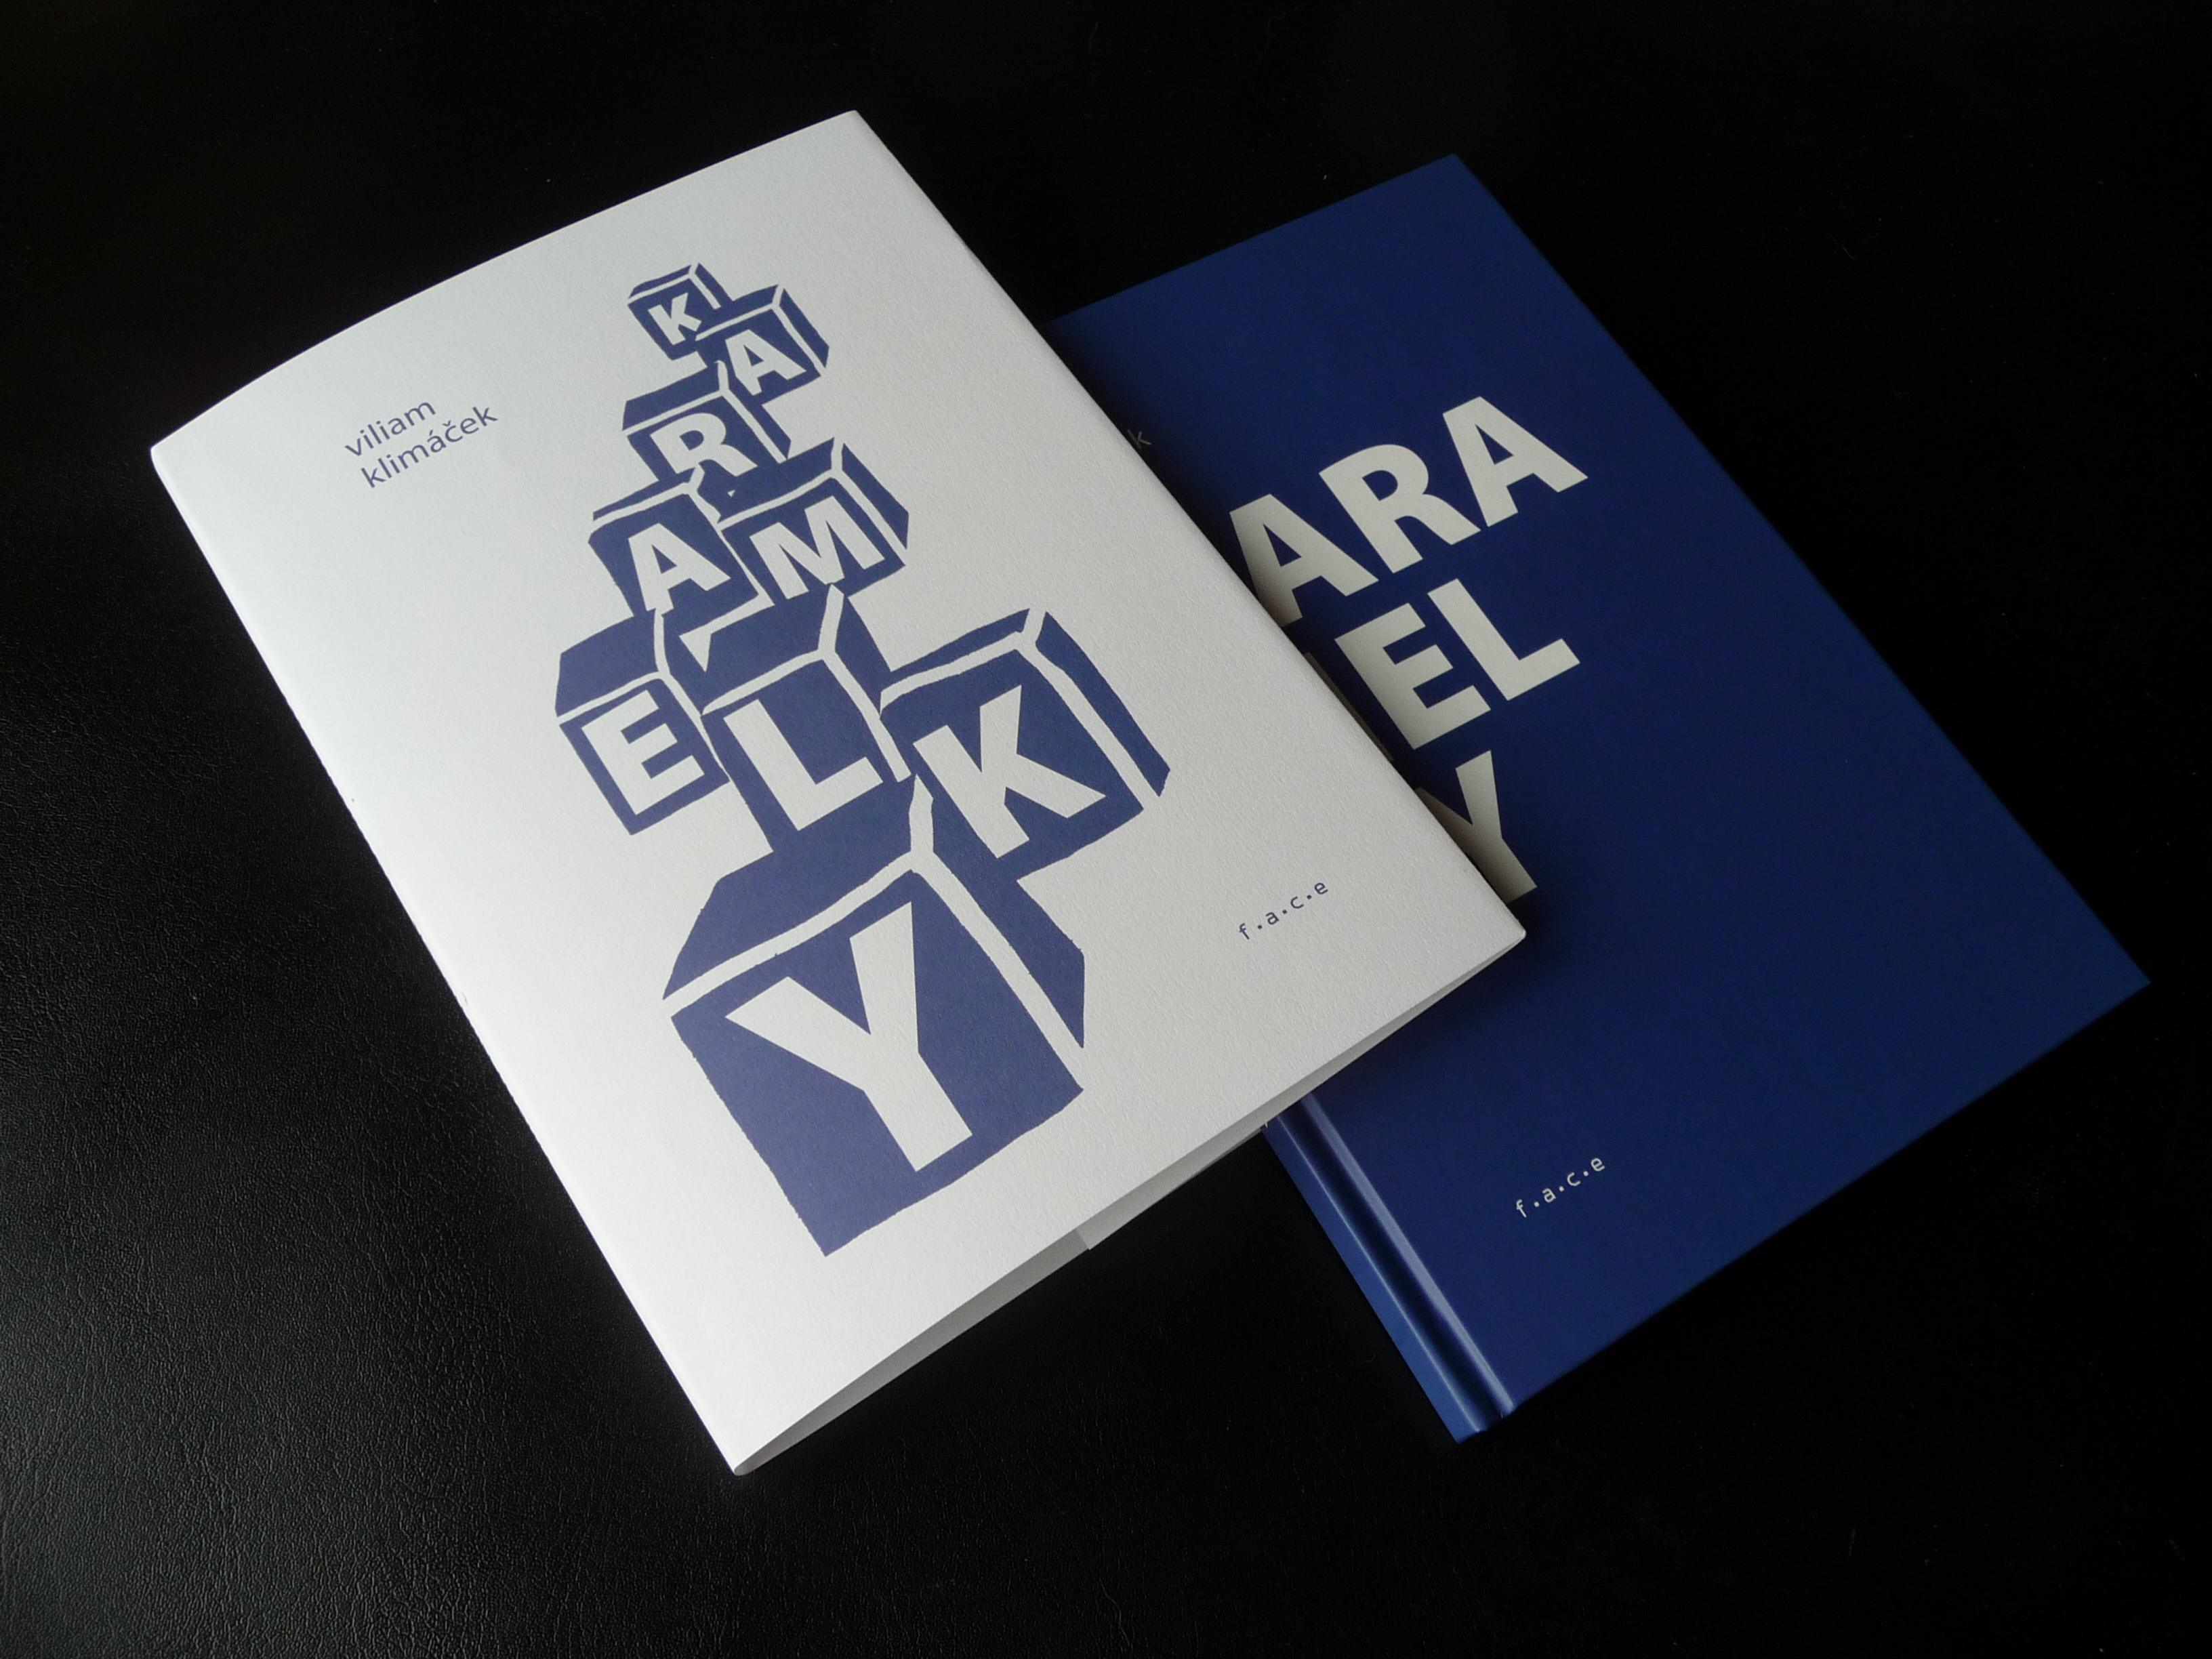 Viliam Klimáček: Karamelky, redesign of publication,  f.a.c.e., 2017